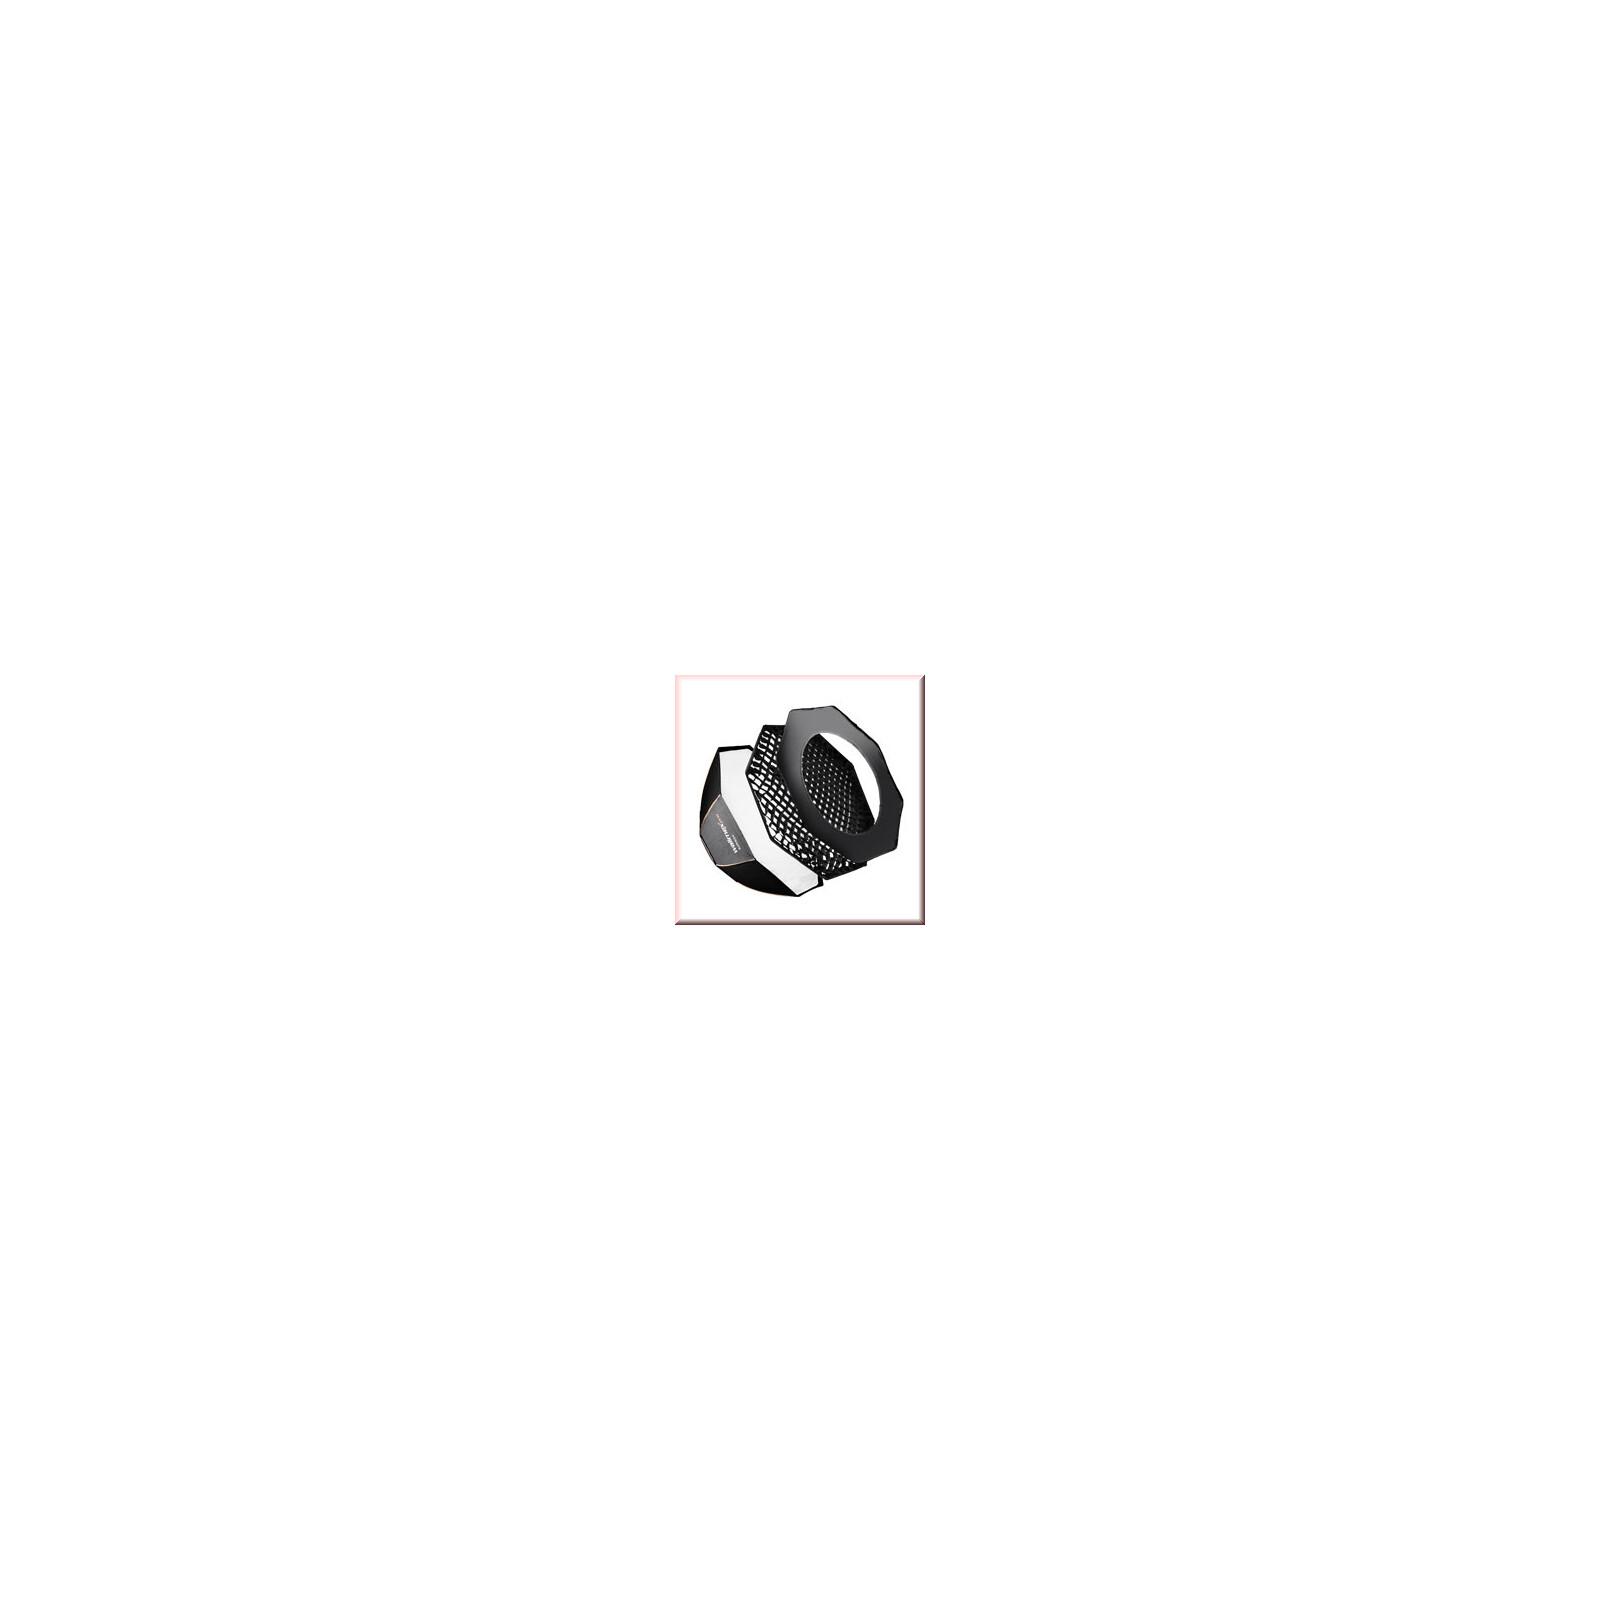 walimex pro Octagon Softbox PLUS OL Ø60 Balcar